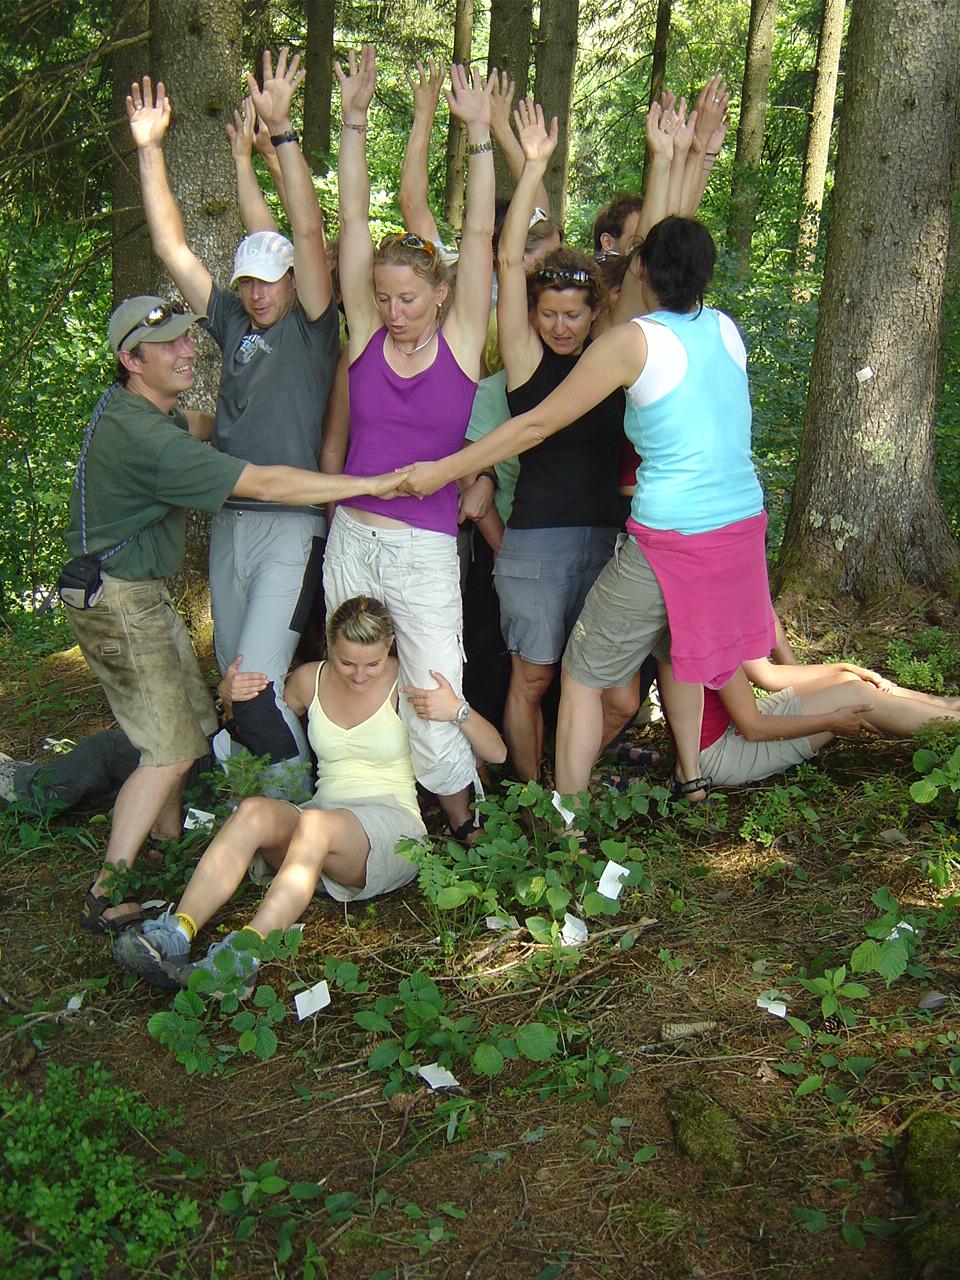 Gruppenübung kennenlernen